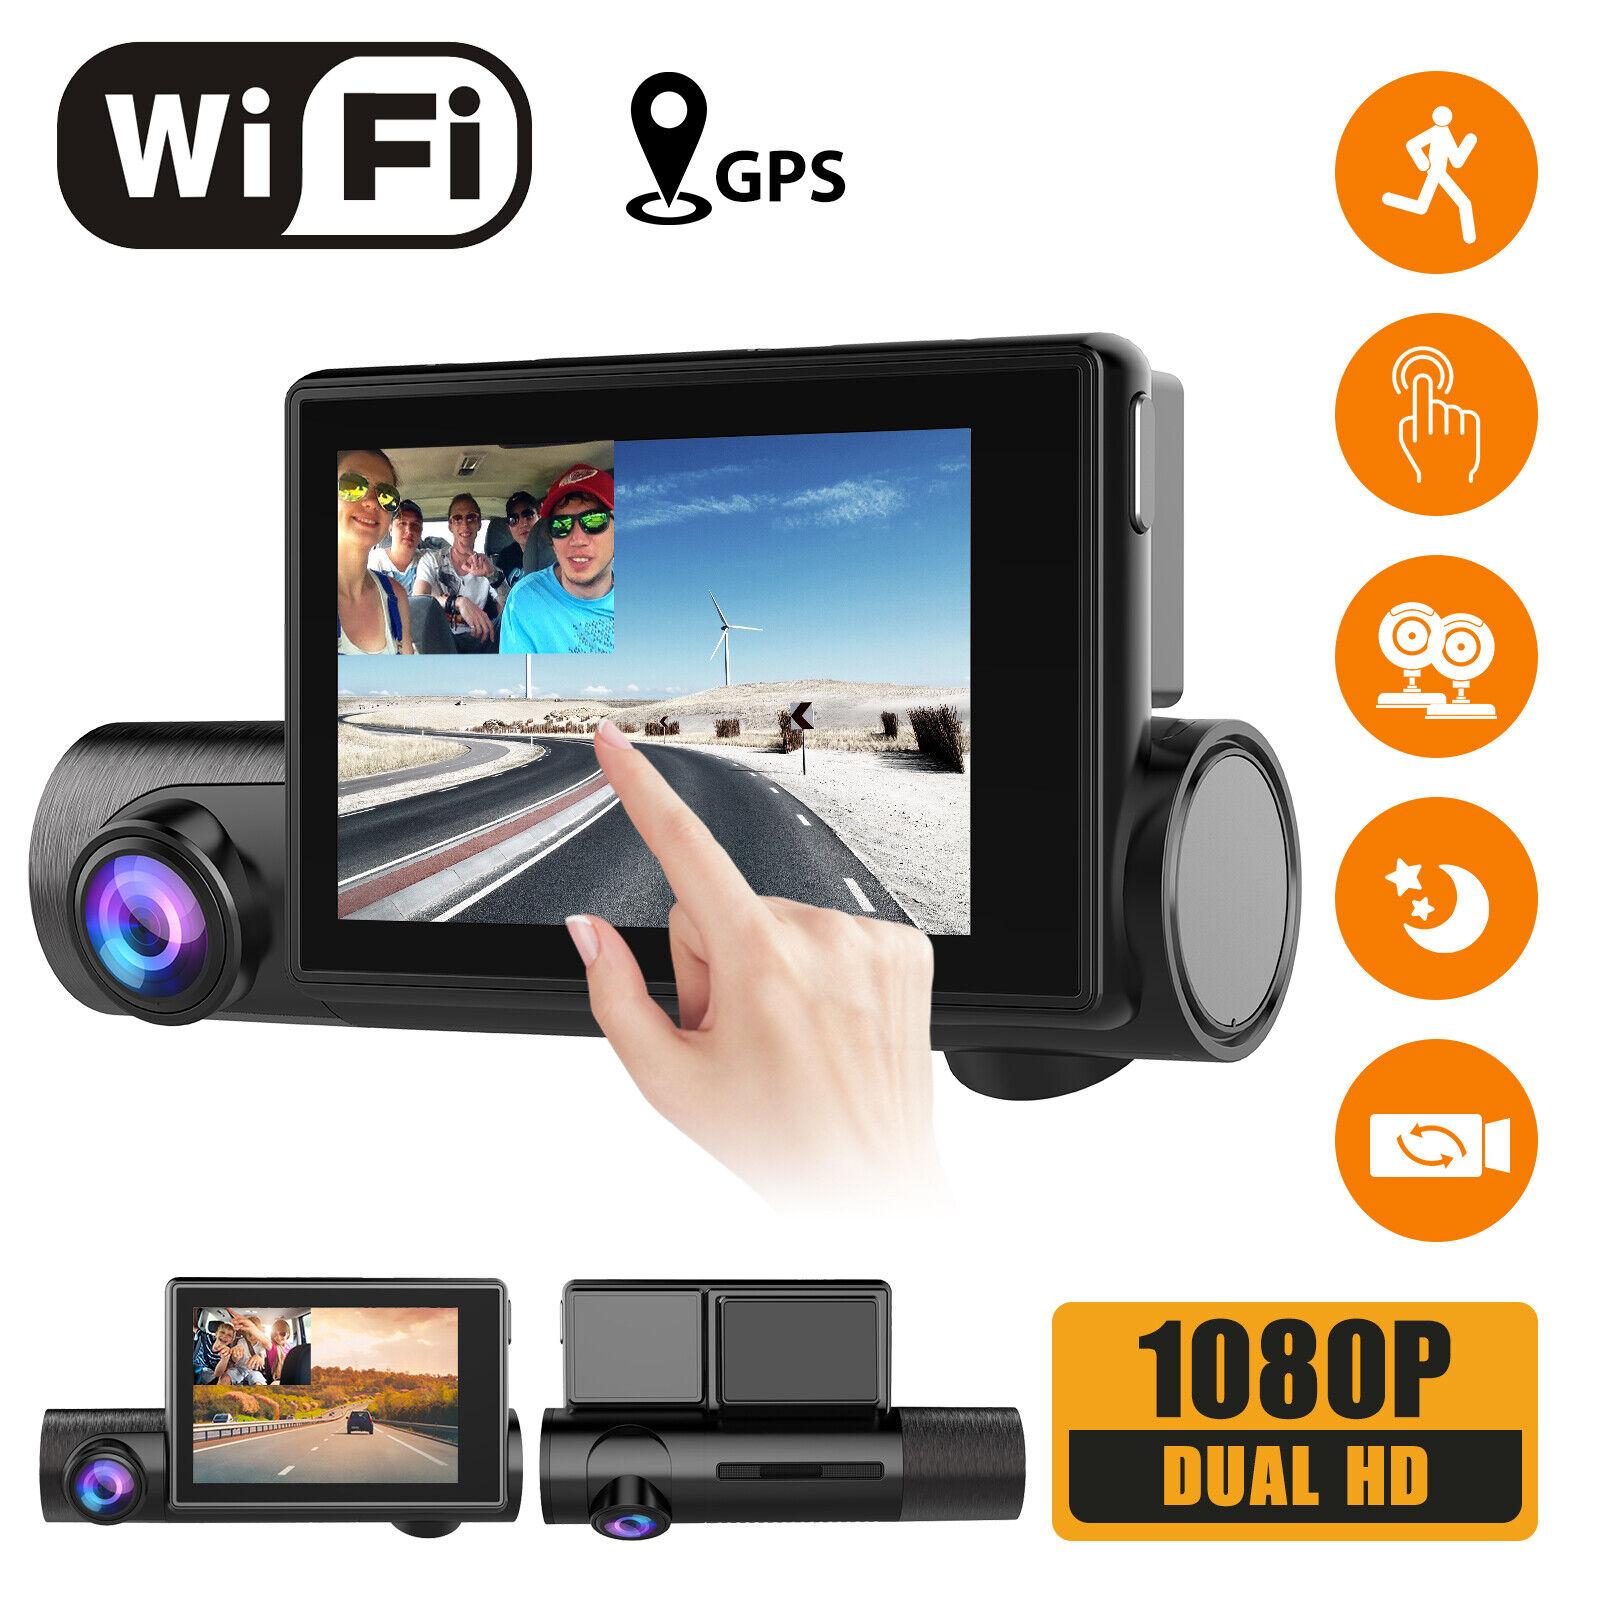 Dual 1080P WiFi Dash Cam,w/ Touch screen GPS Front & Inside Camera Night Vision 1080p camera dash dual Featured front gps inside screen touch wifi